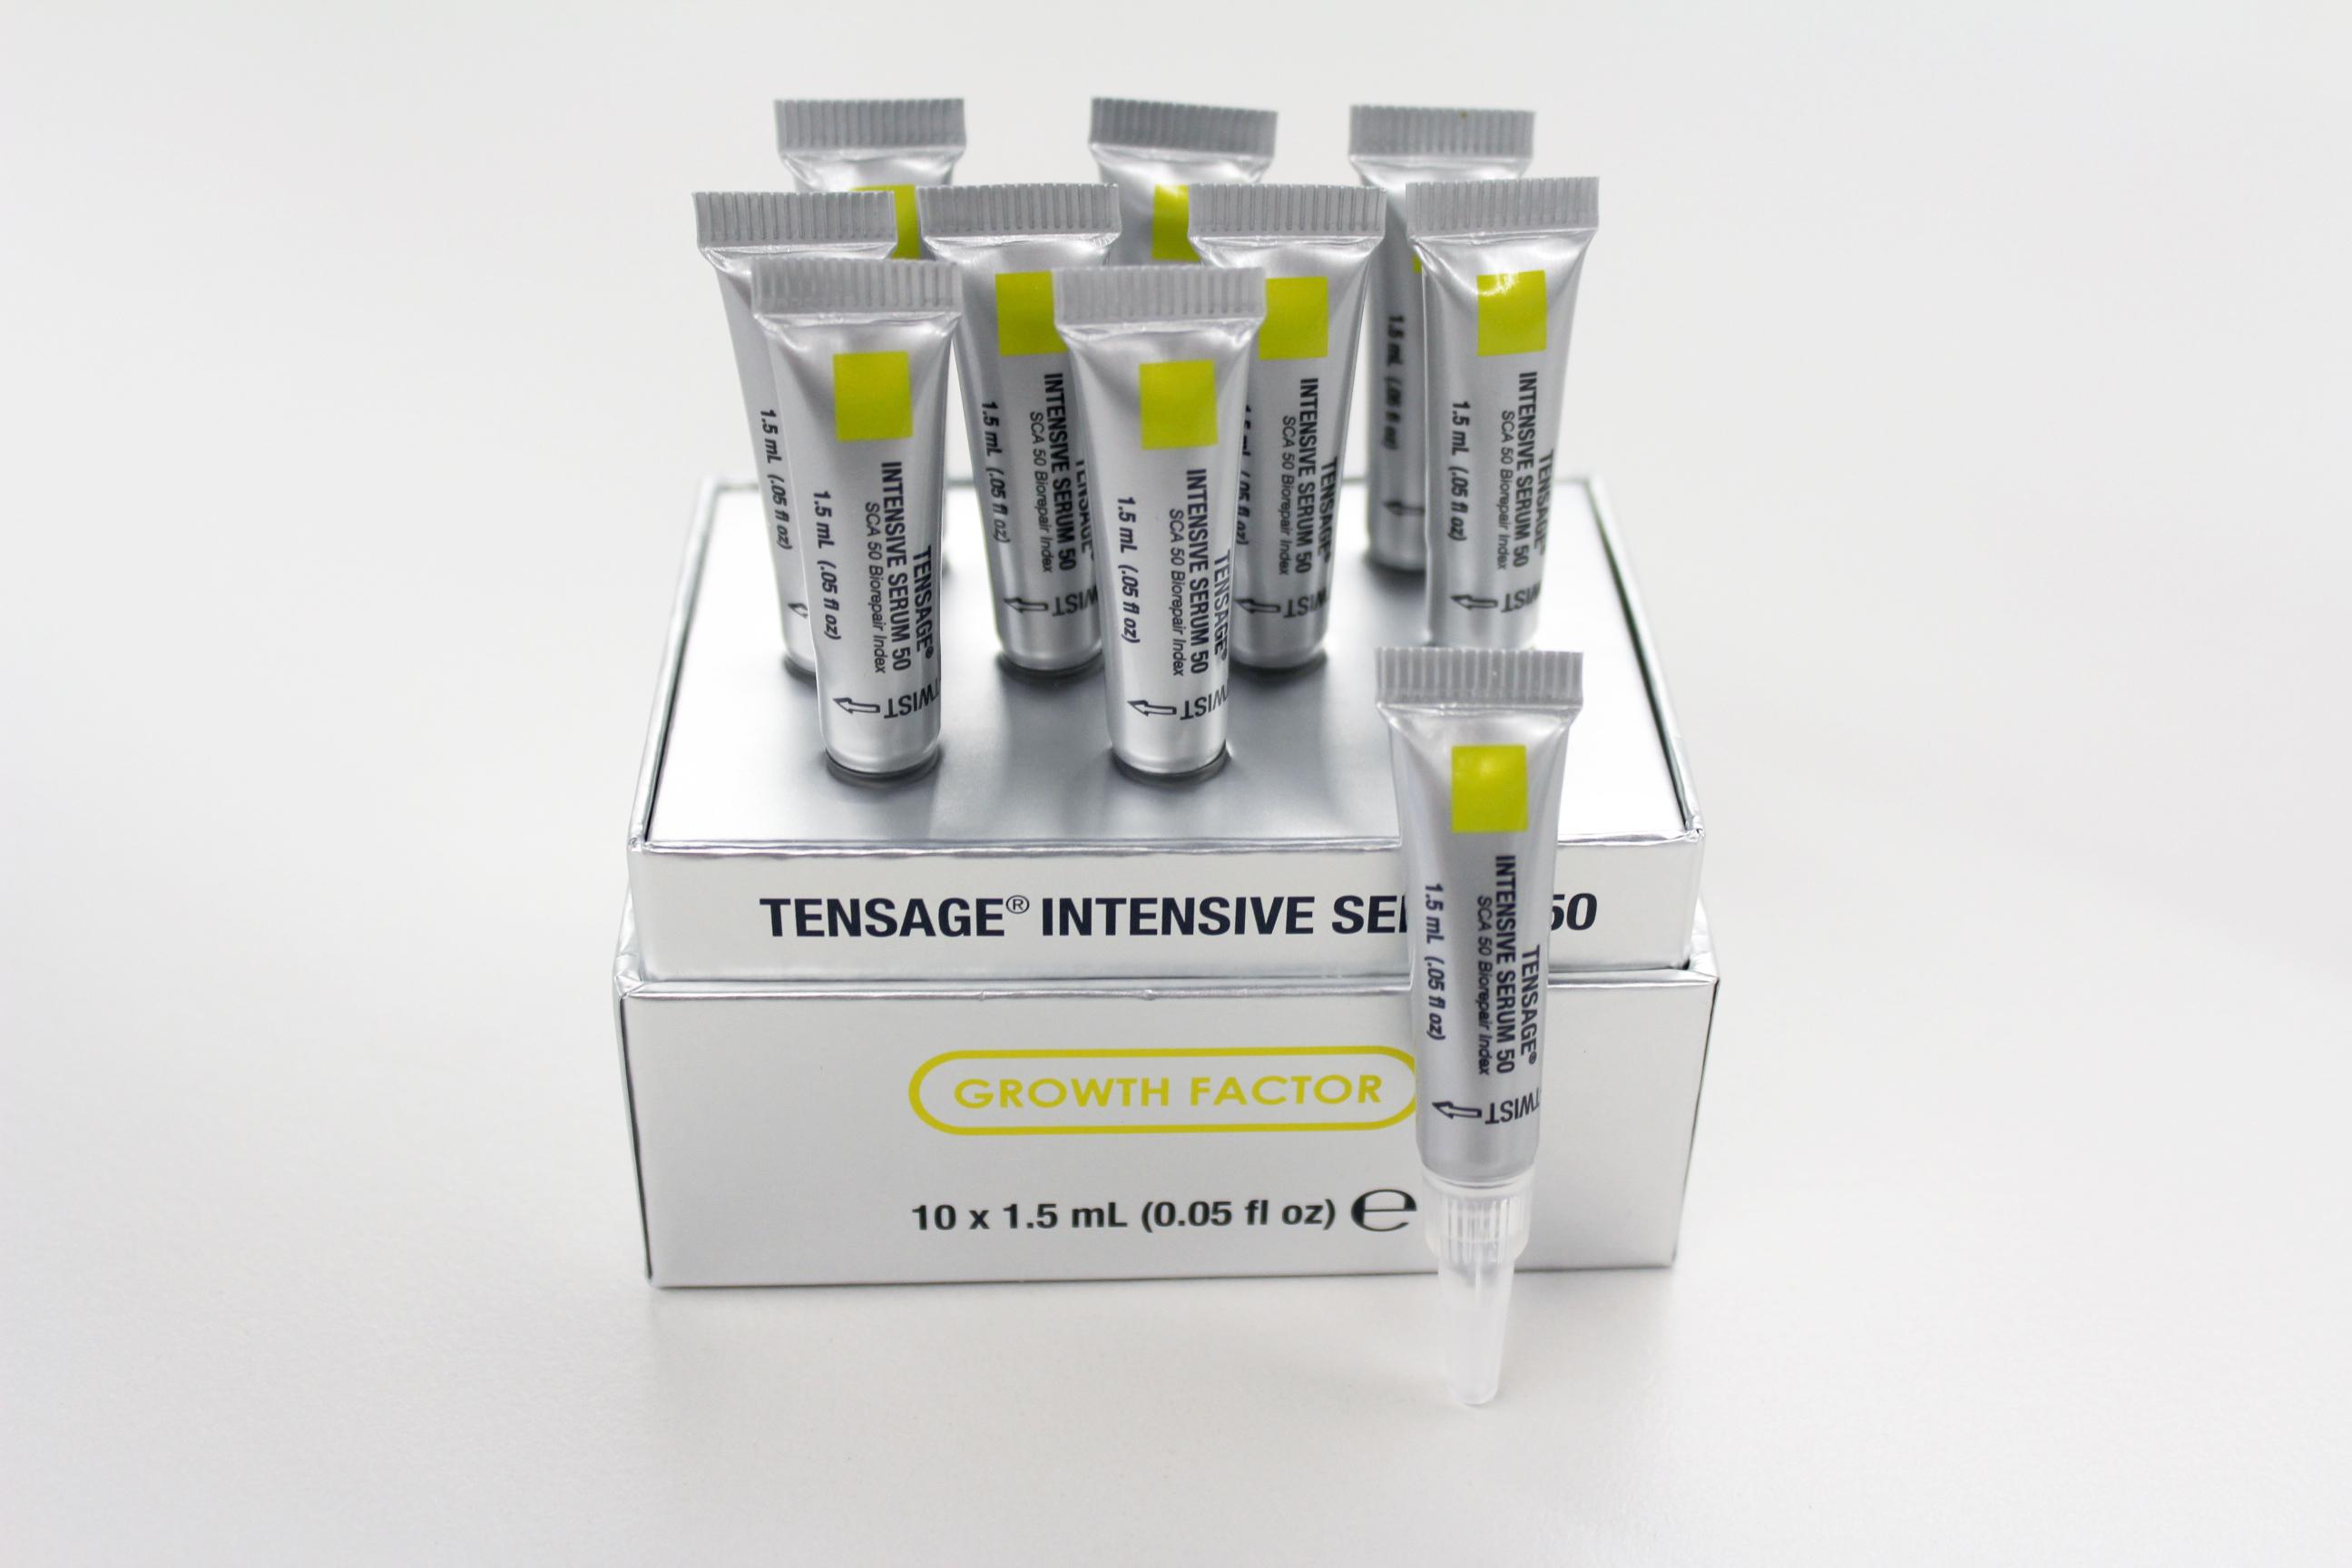 Neopac The Tube 10Mm Biopelle Twistnuse Tensage